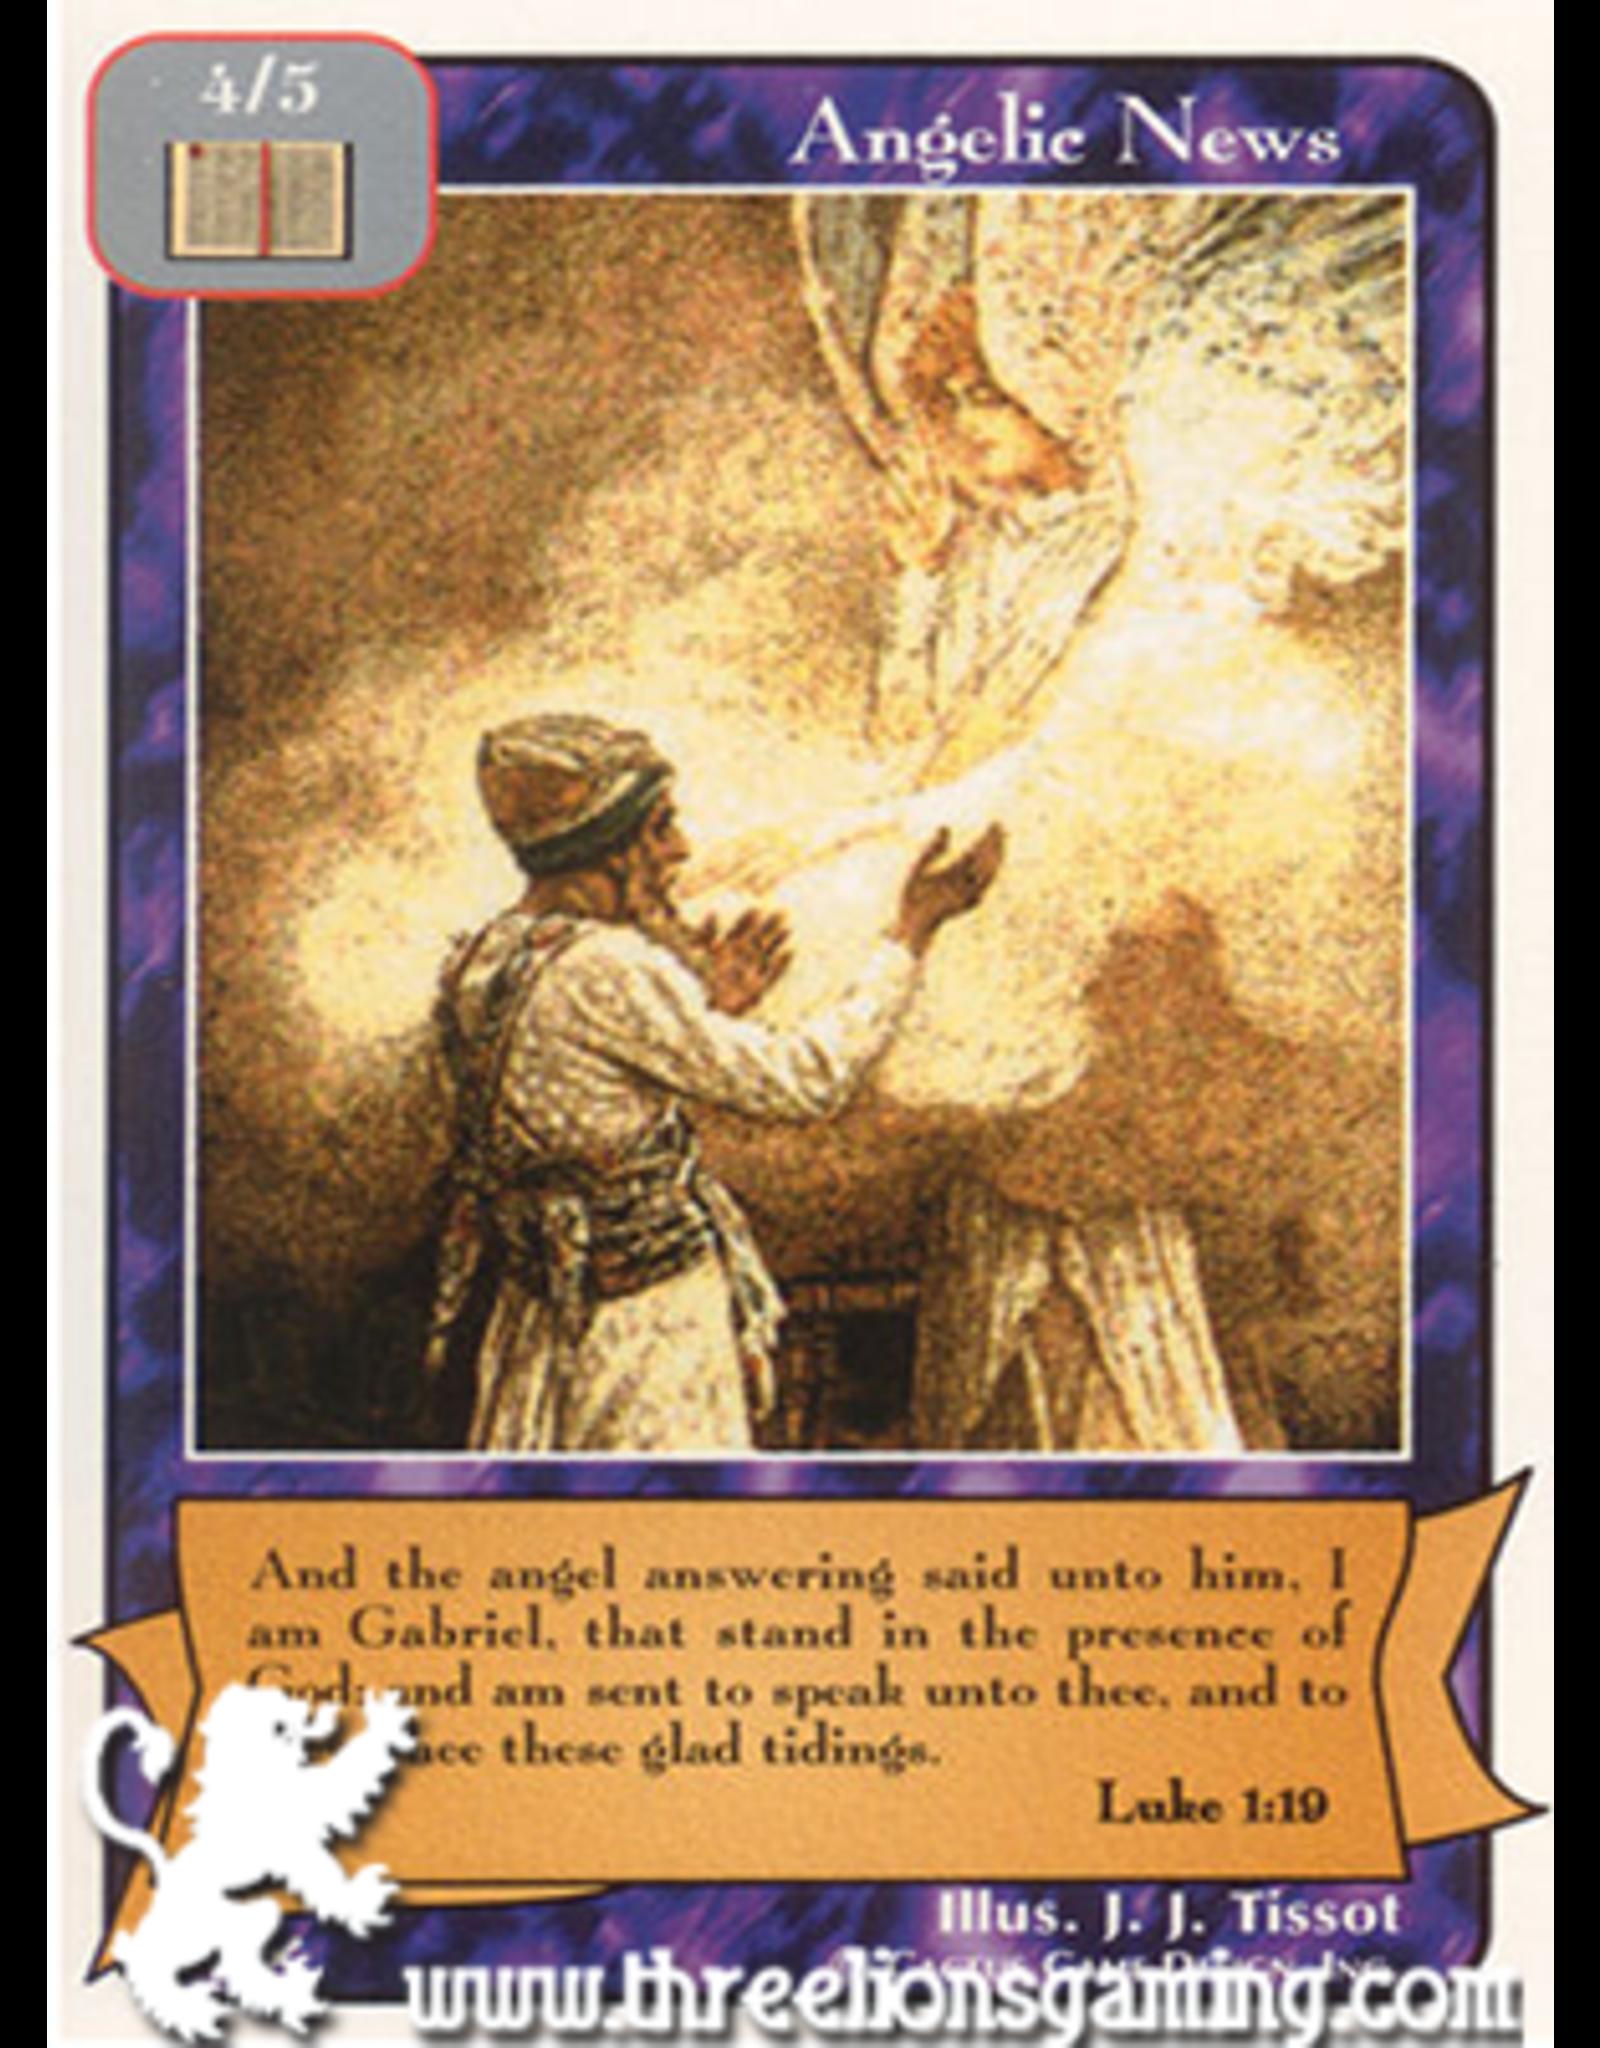 Ap: Angelic News